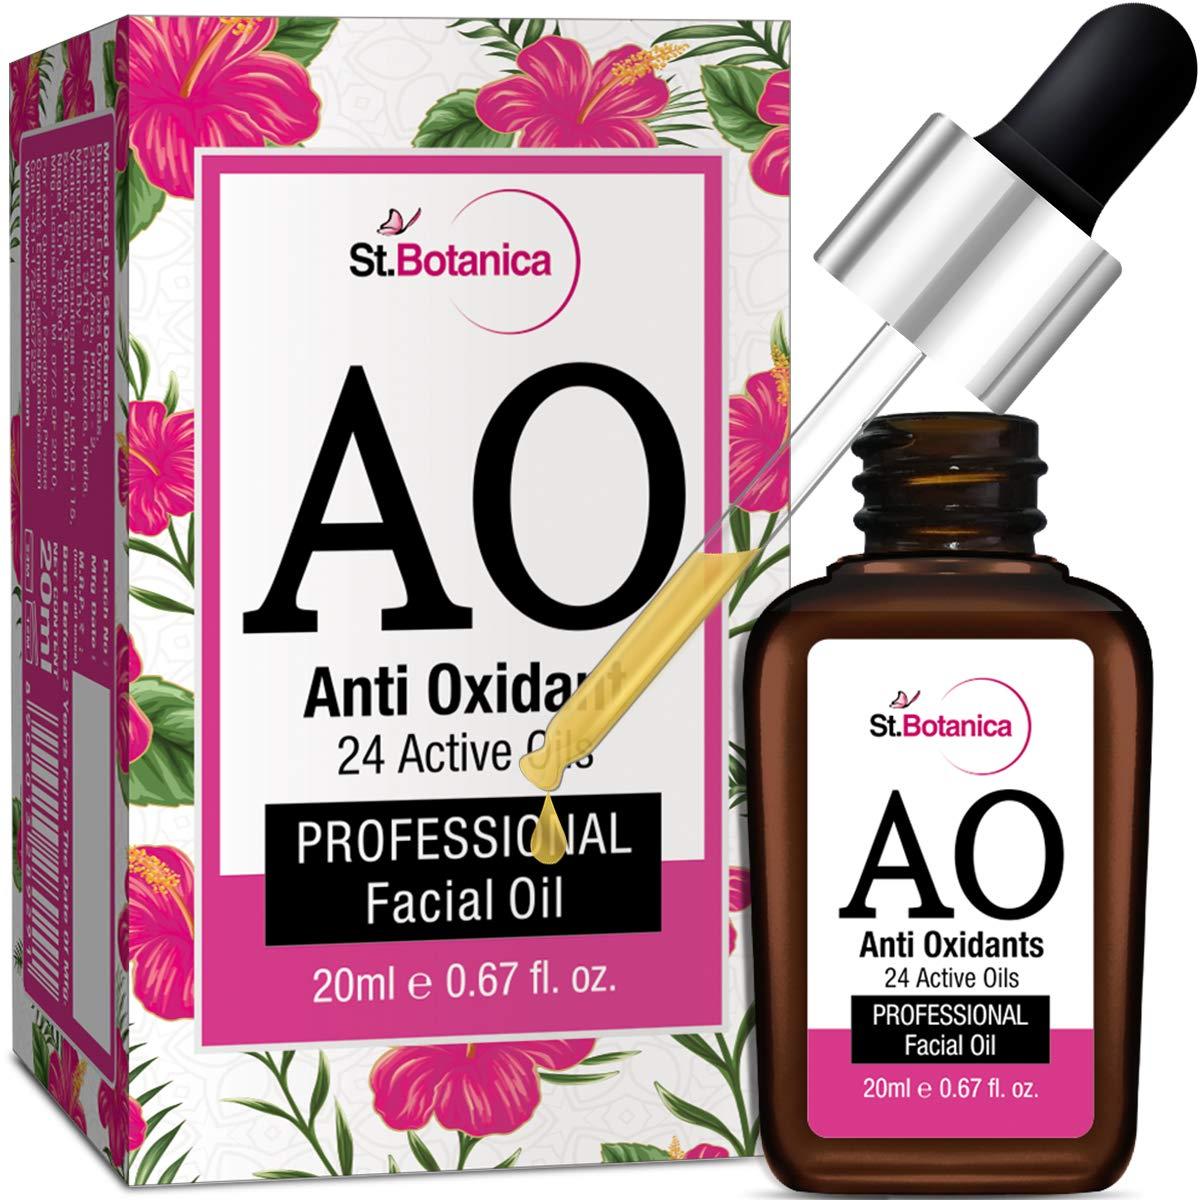 StBotanica Anti Oxidant (24 Active Oils) Professional Facial